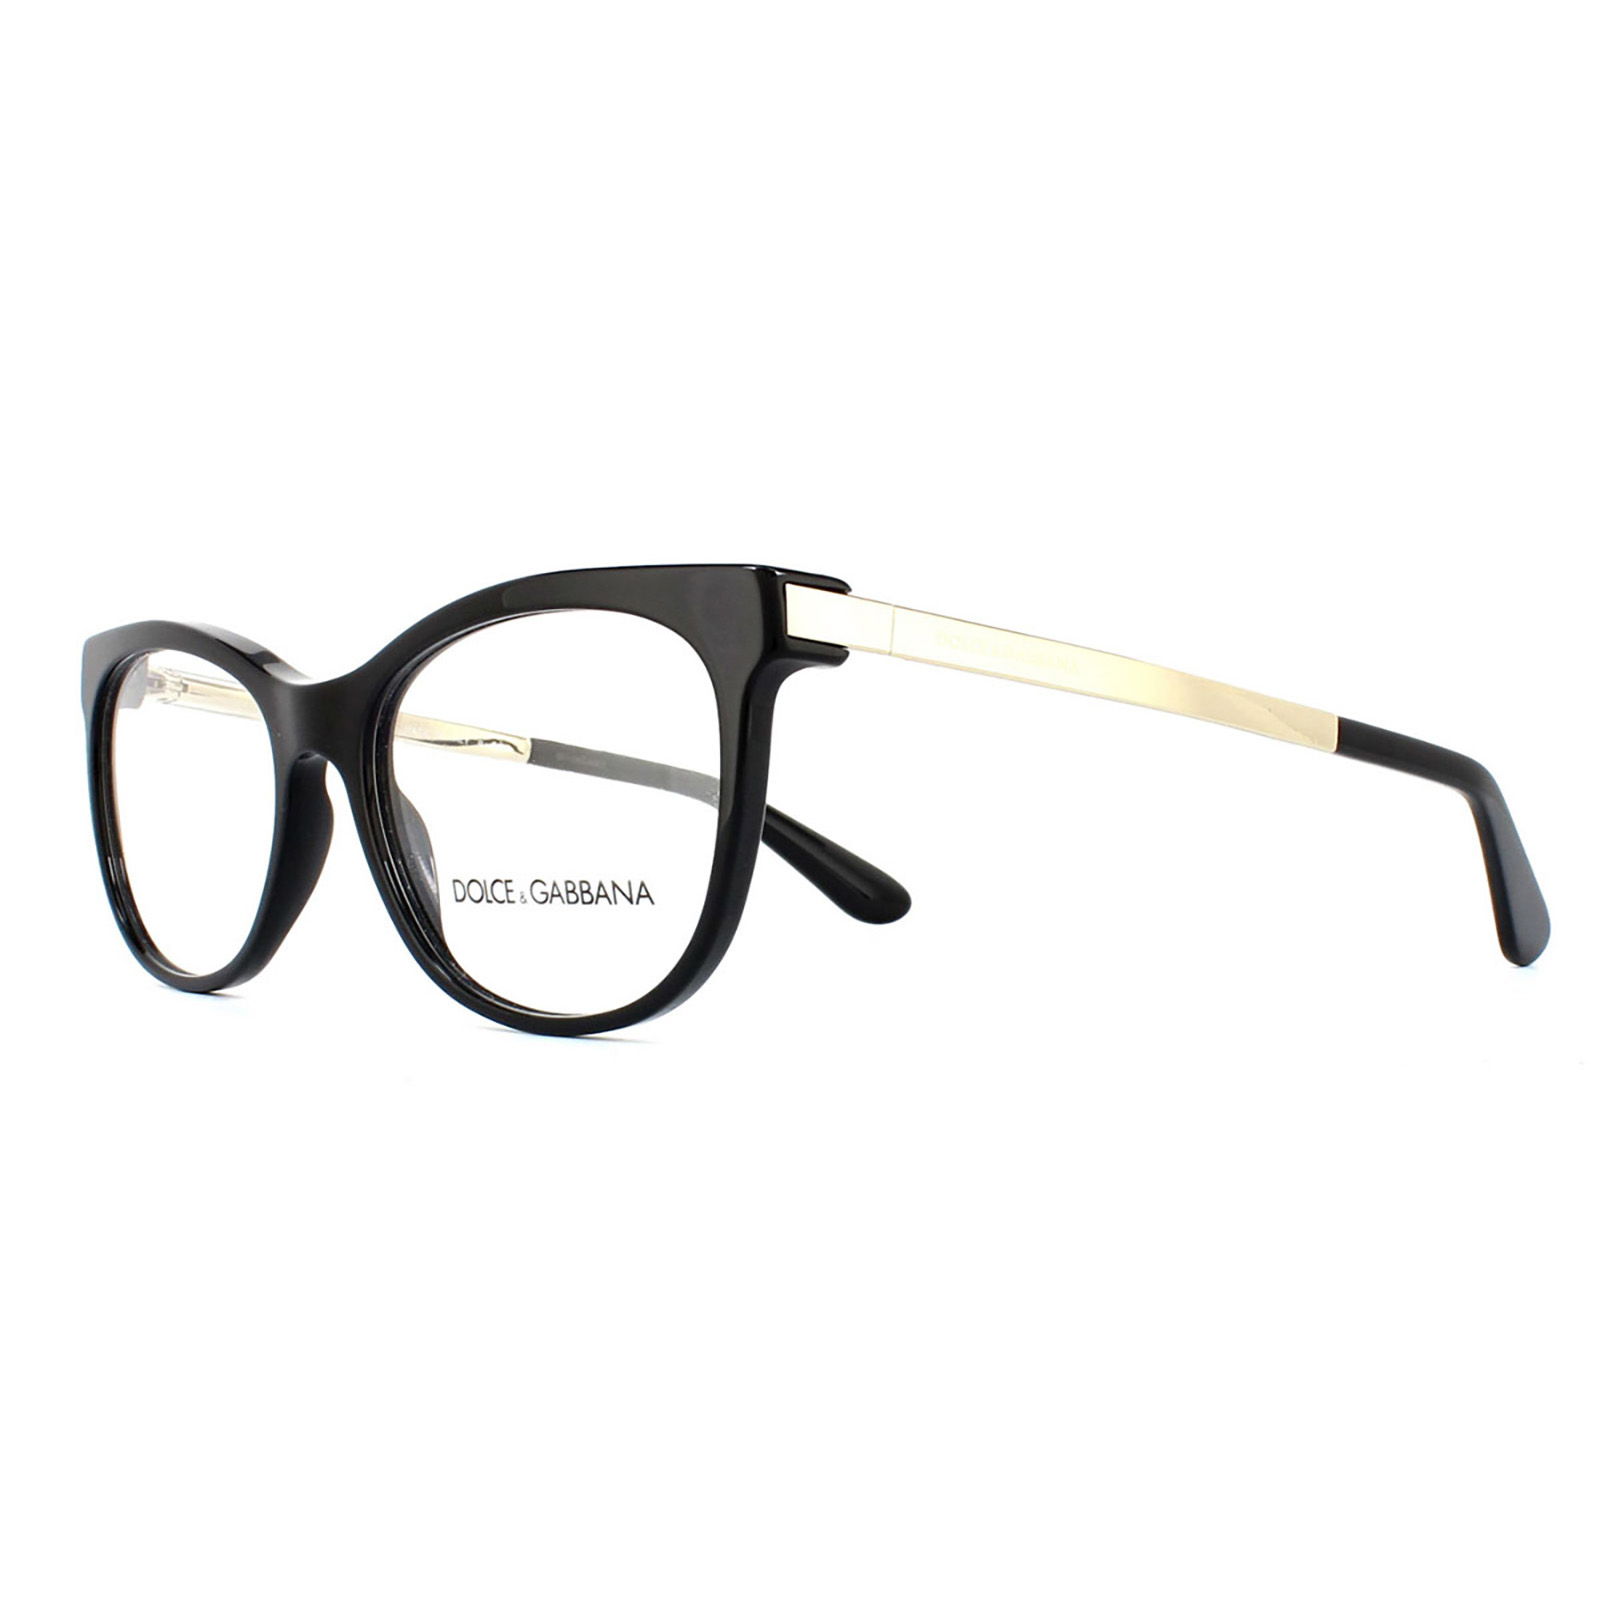 sentinel dolce and gabbana glasses frames 3234 501 black womens 52mm - Dolce And Gabbana Glasses Frames